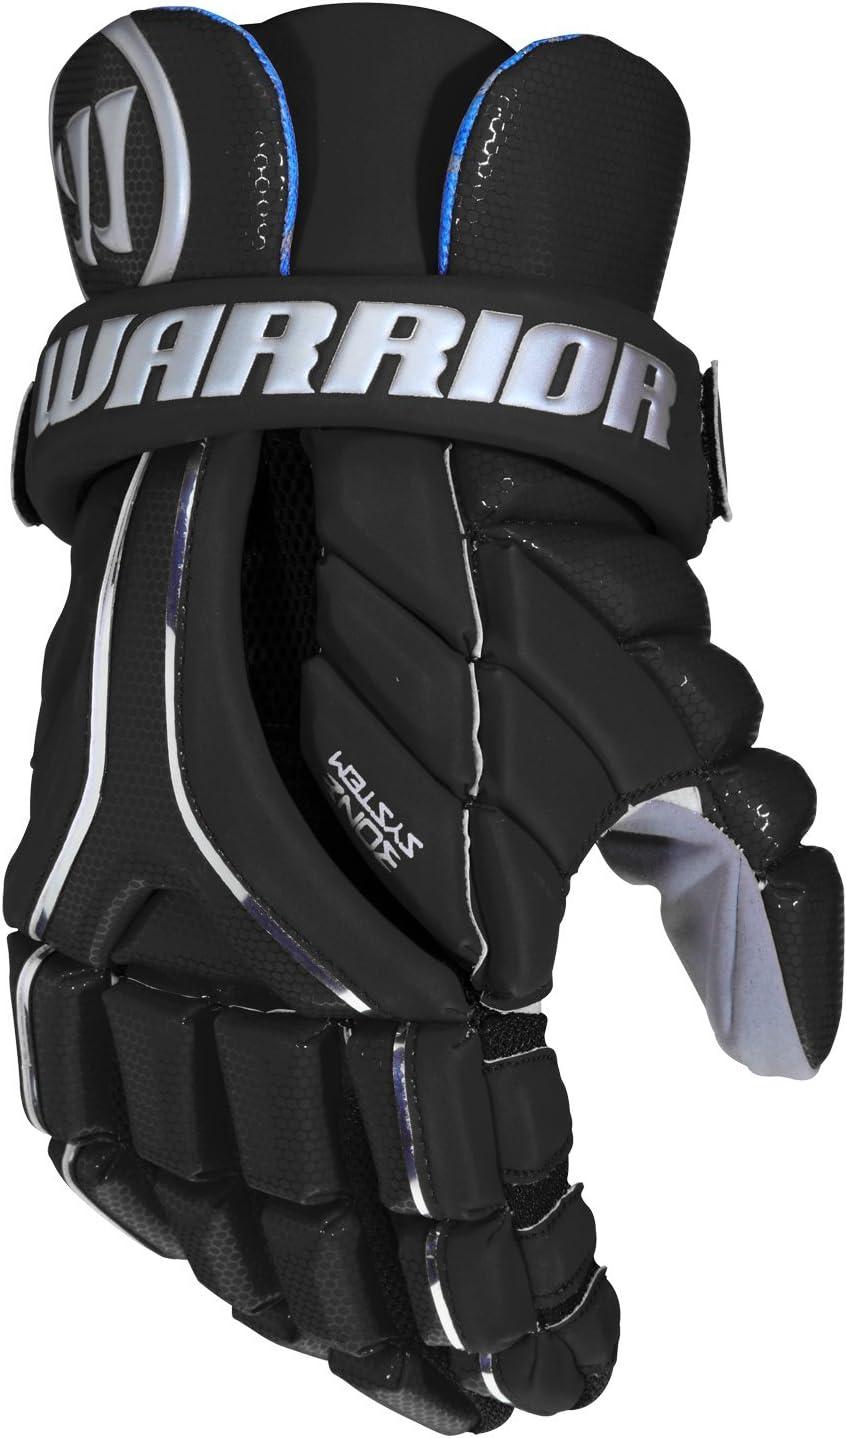 Warrior 2017 Evo Lacrosse Gloves : Sports & Outdoors